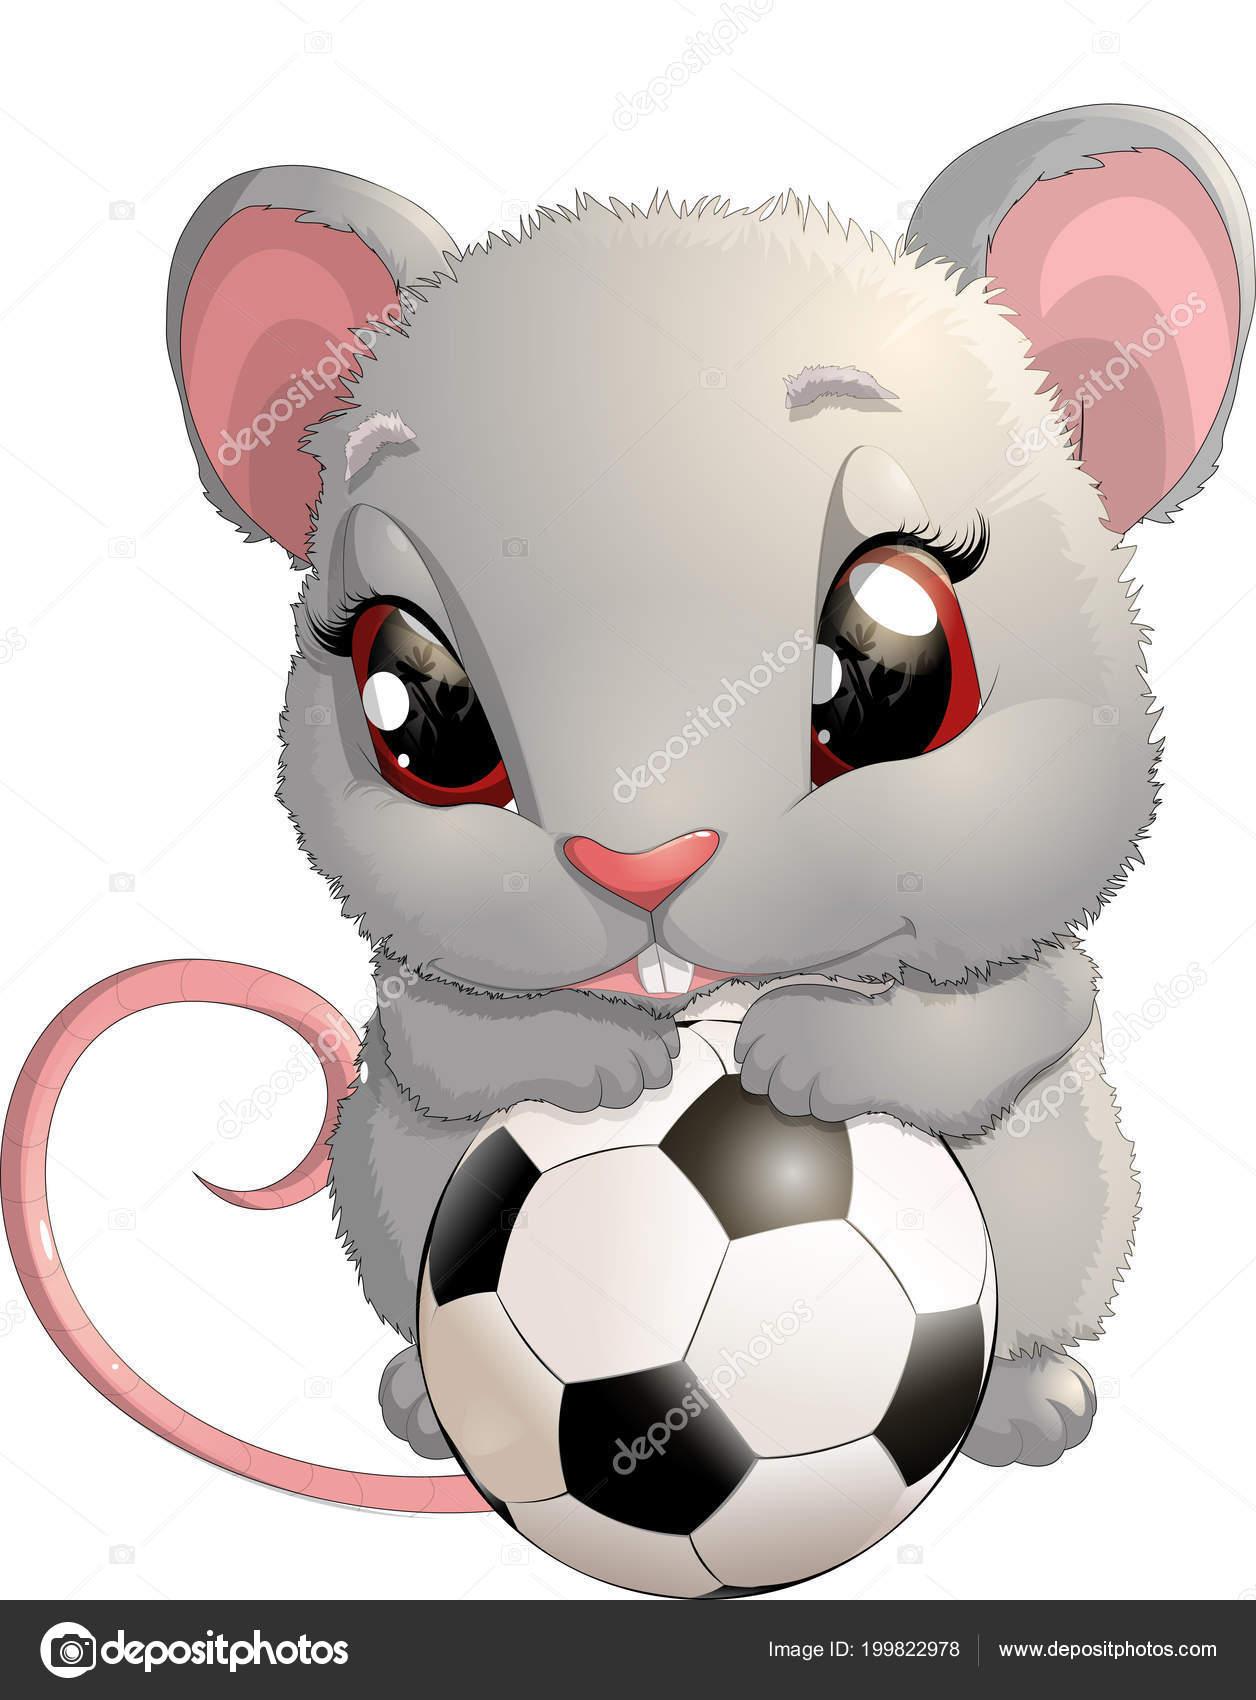 Schöne Süße Maus Stockvektor Andryuha19811 199822978